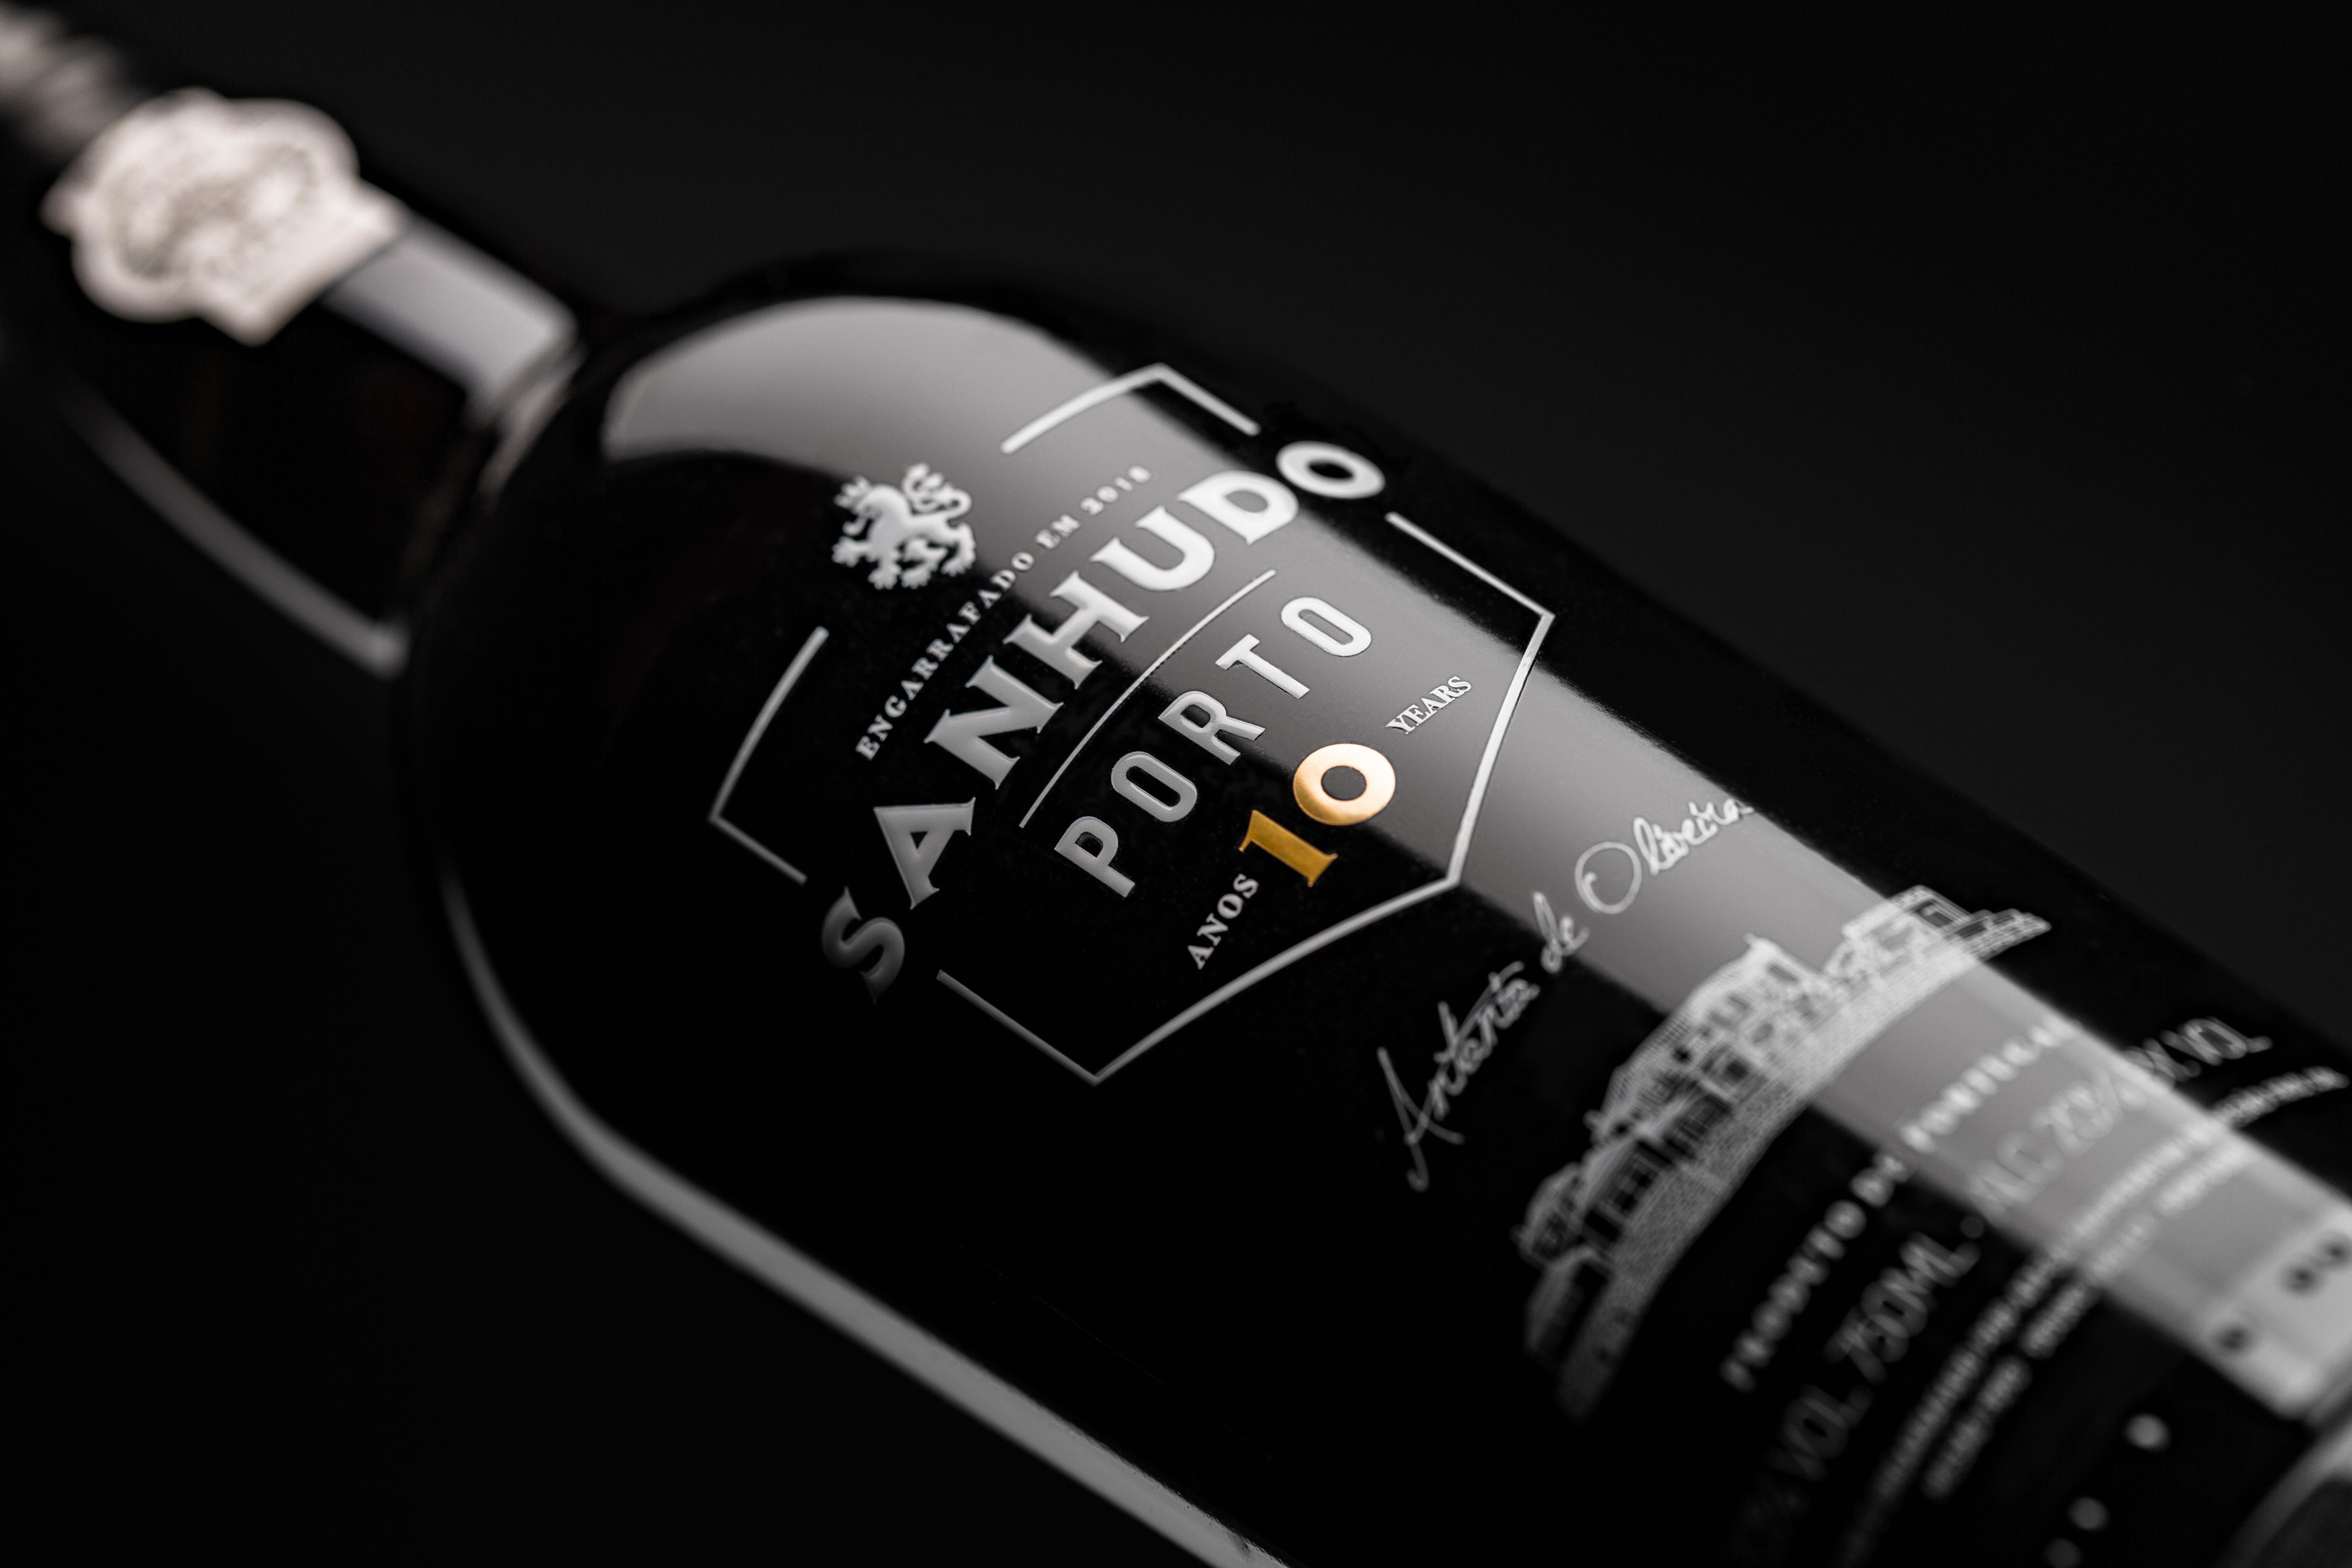 Sanhudo wine